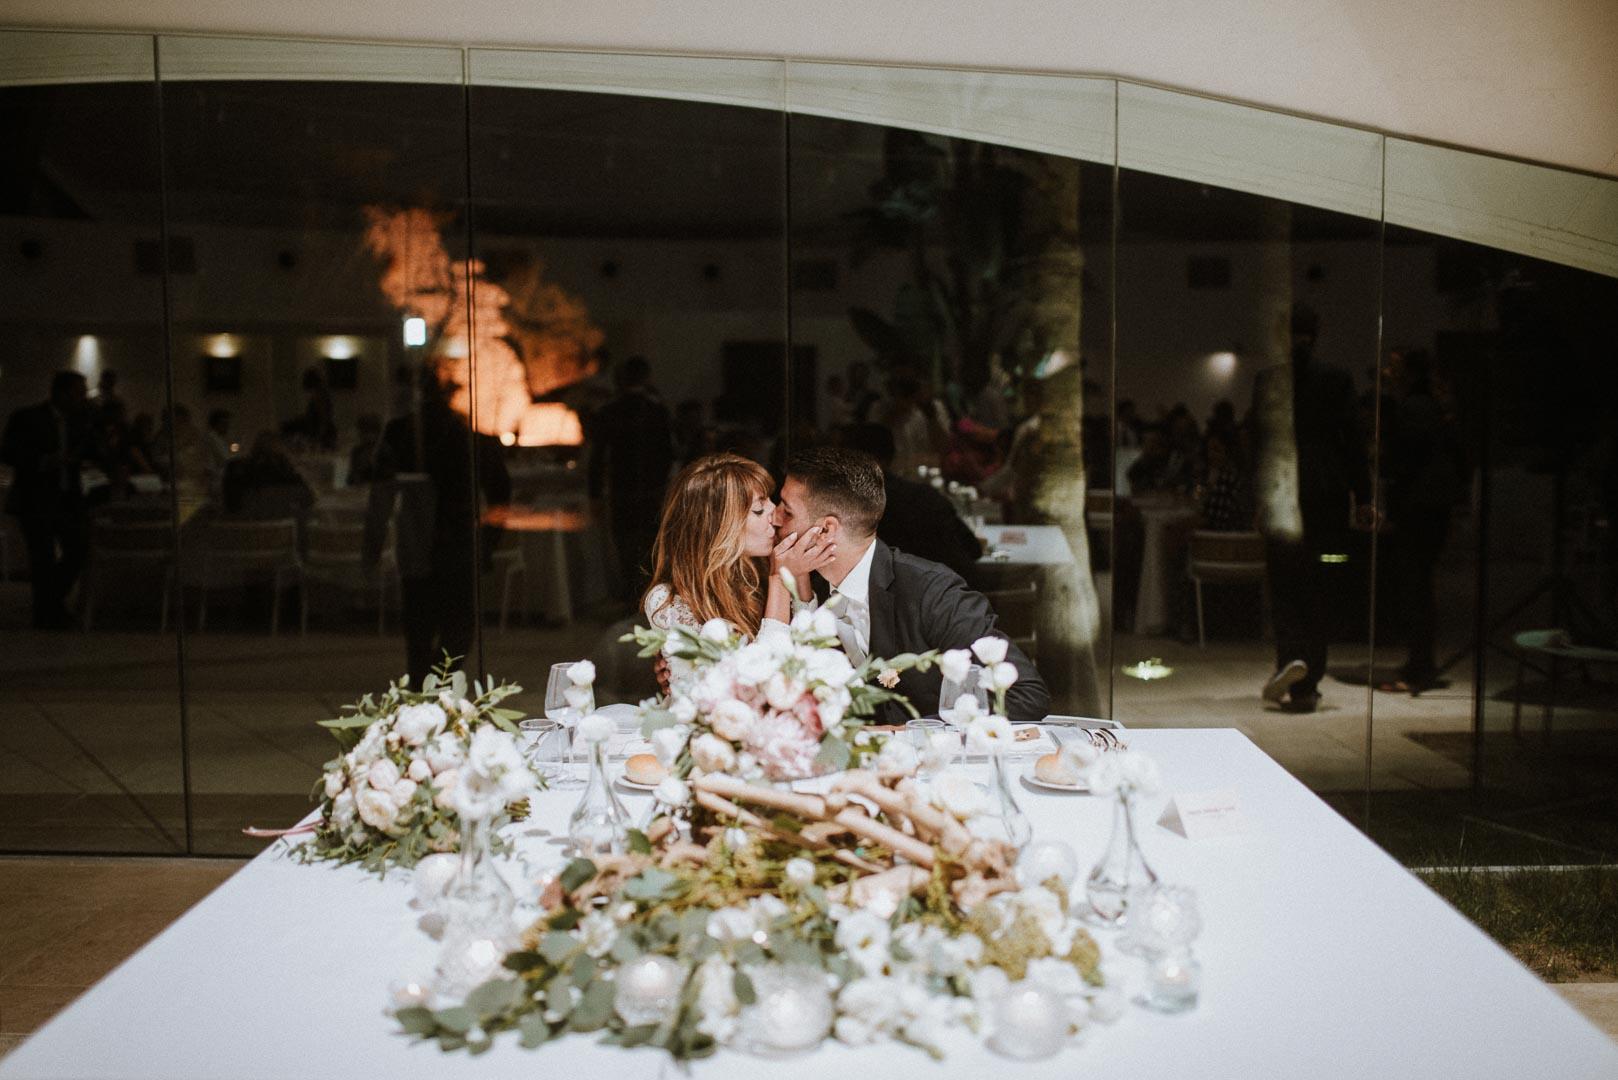 wedding-photographer-destination-fineart-bespoke-reportage-napoli-nabilah-vivianeizzo-spazio46-175